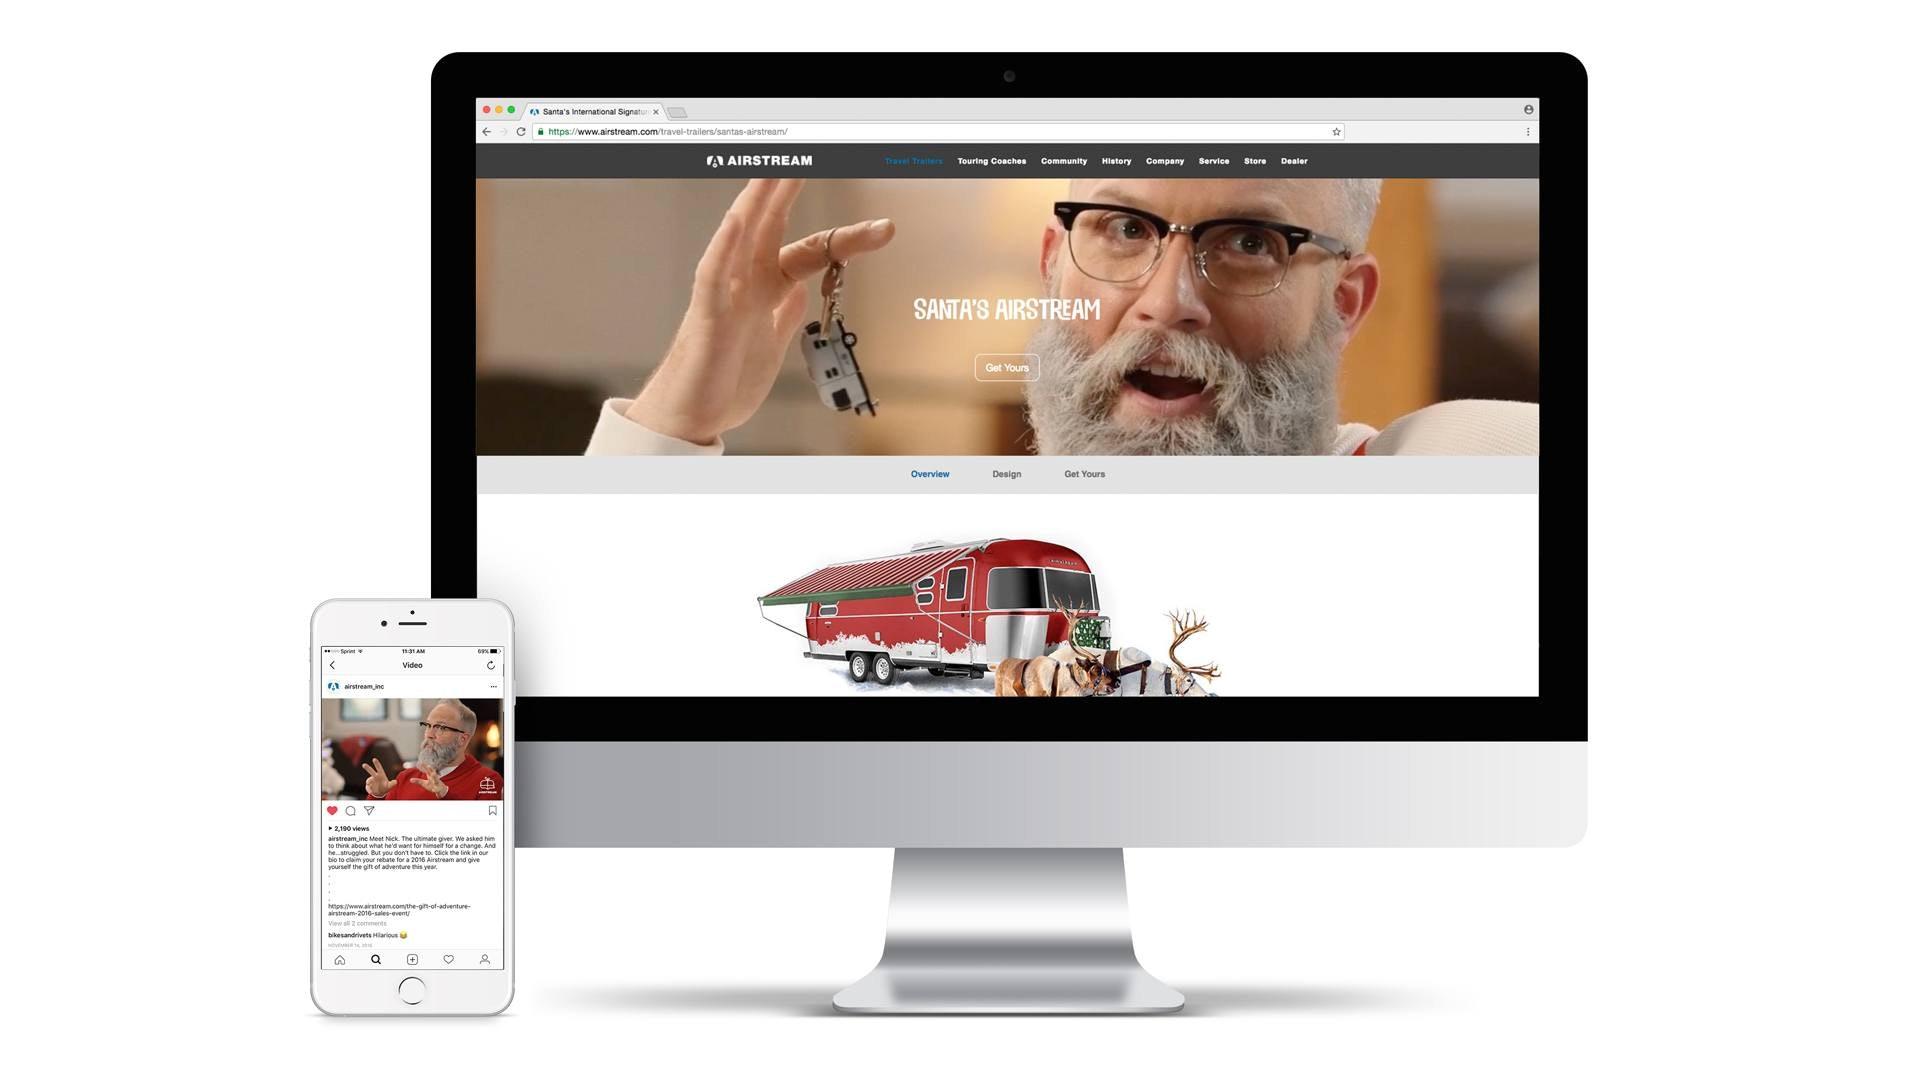 desktop image of a digital marketing campaign featuring santa